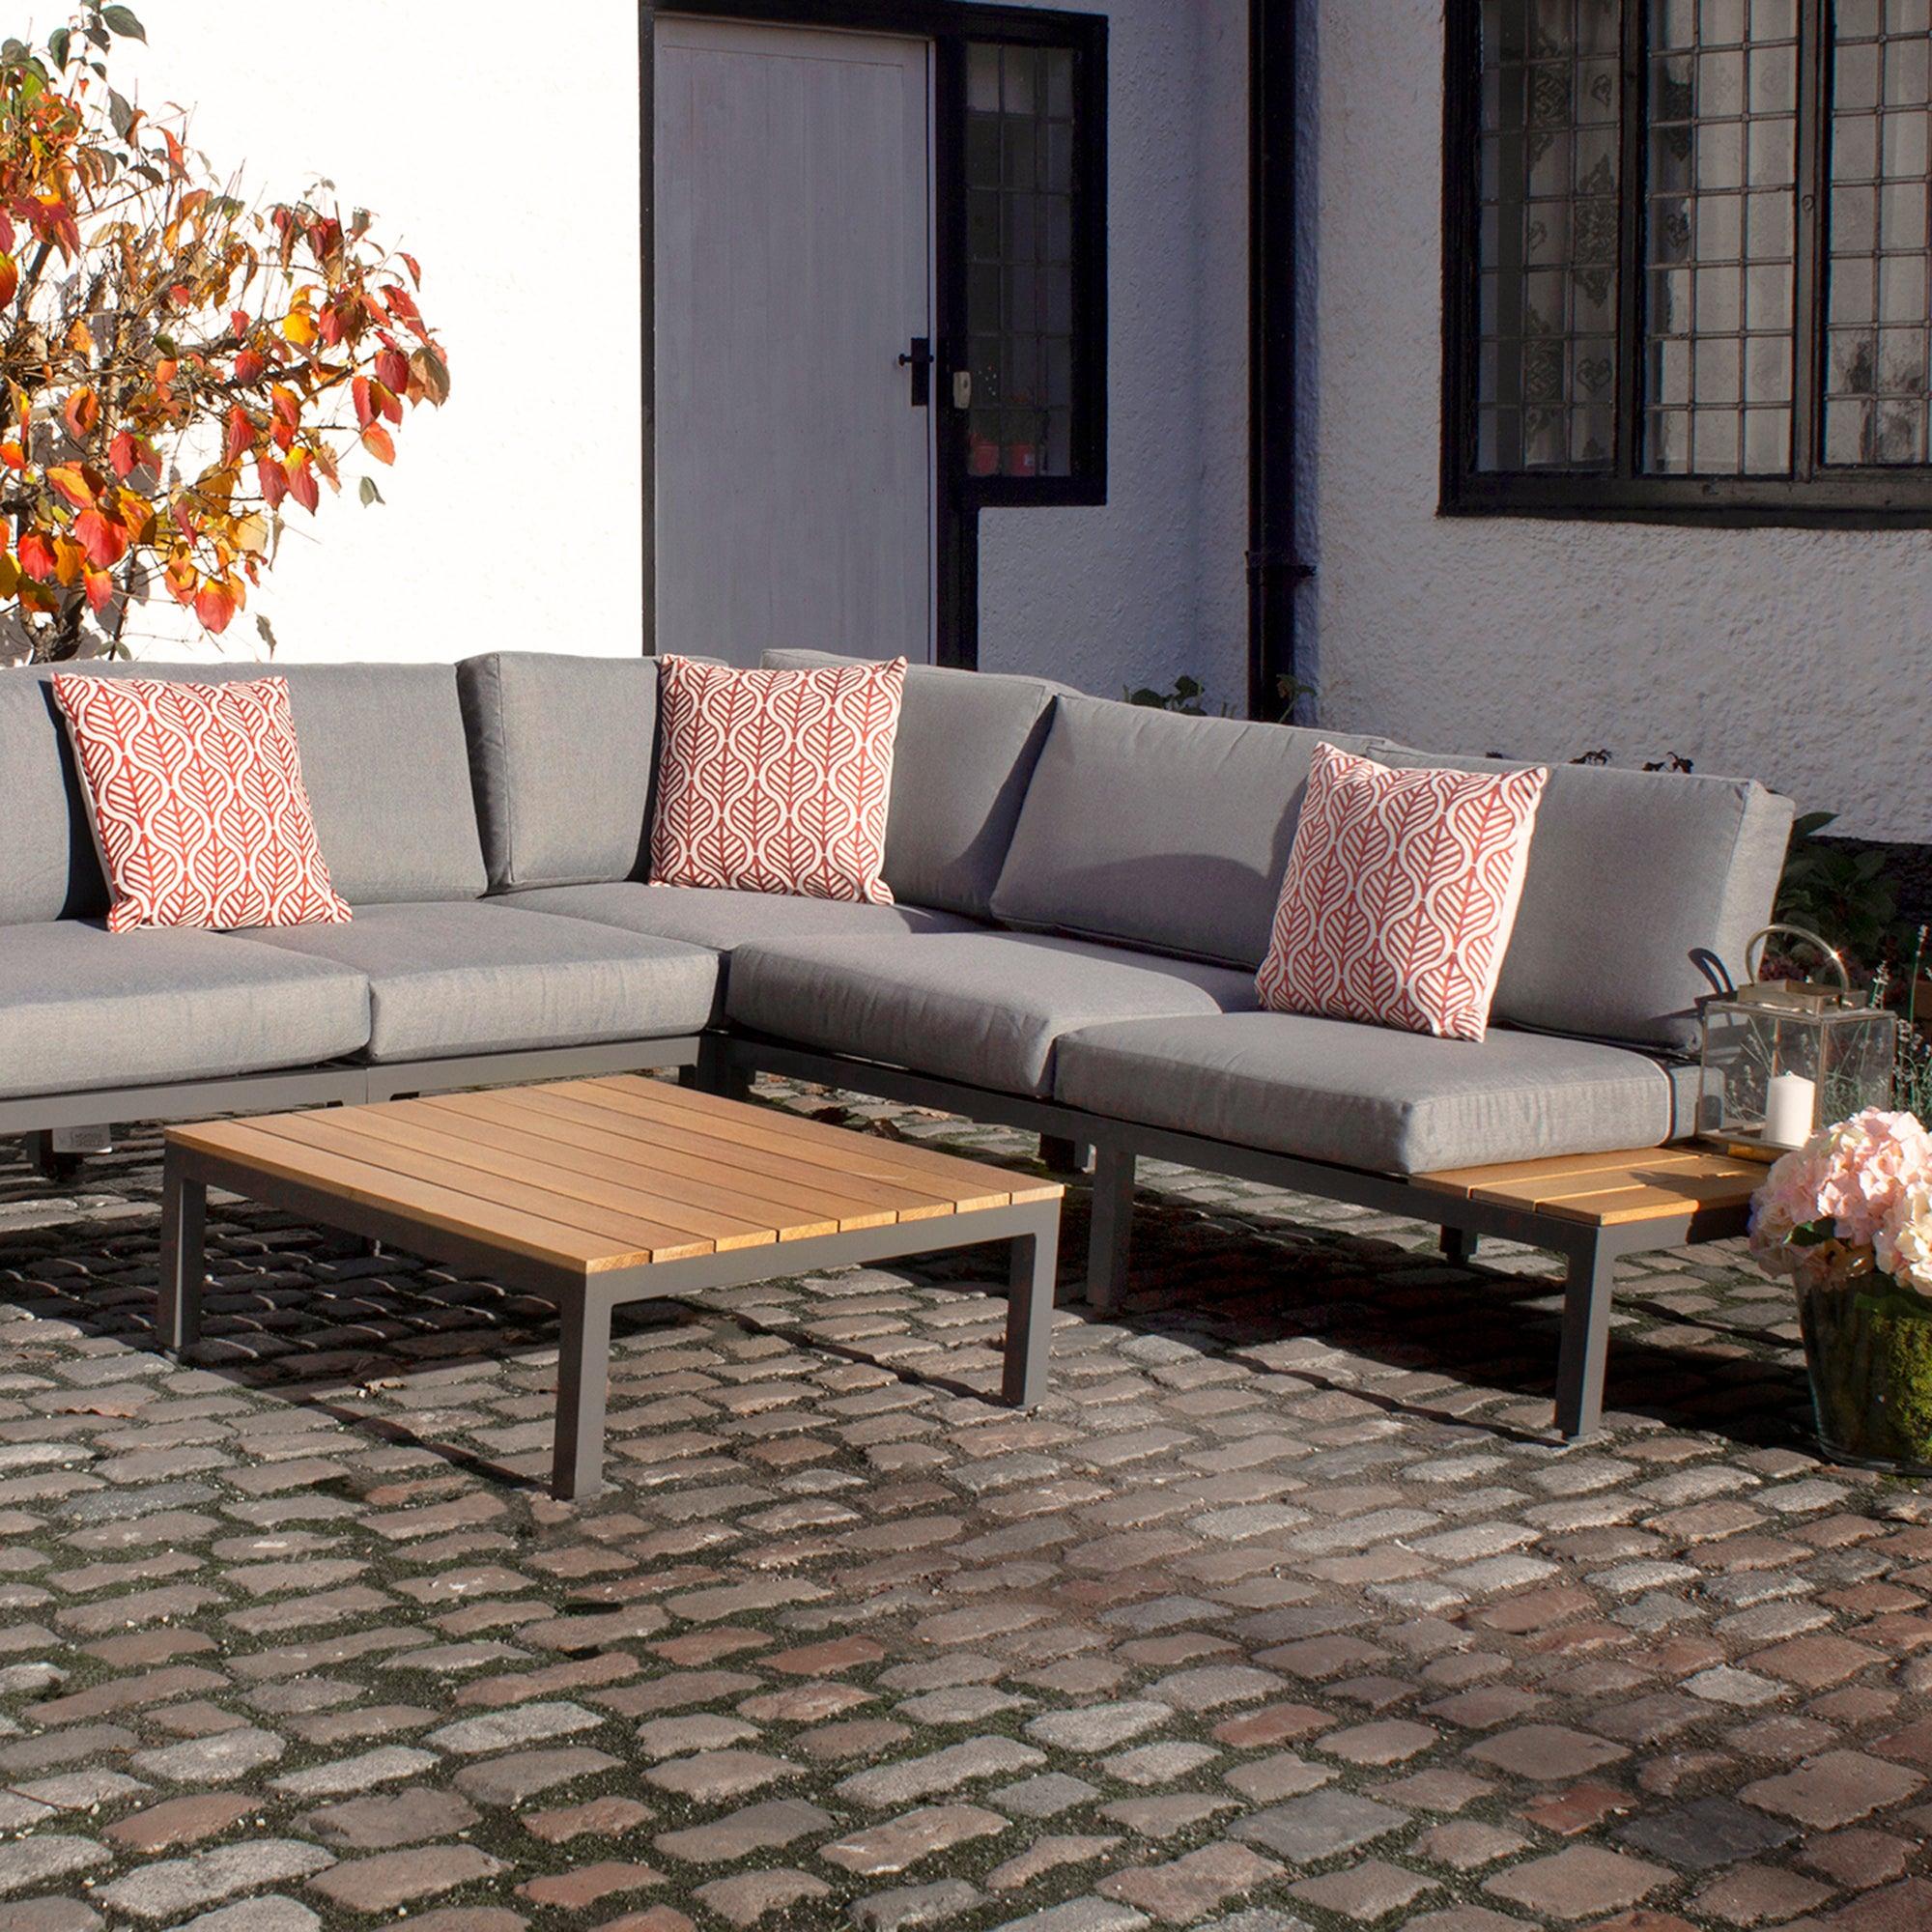 Aspen 6 Seater Modular Corner Sofa Set Grey